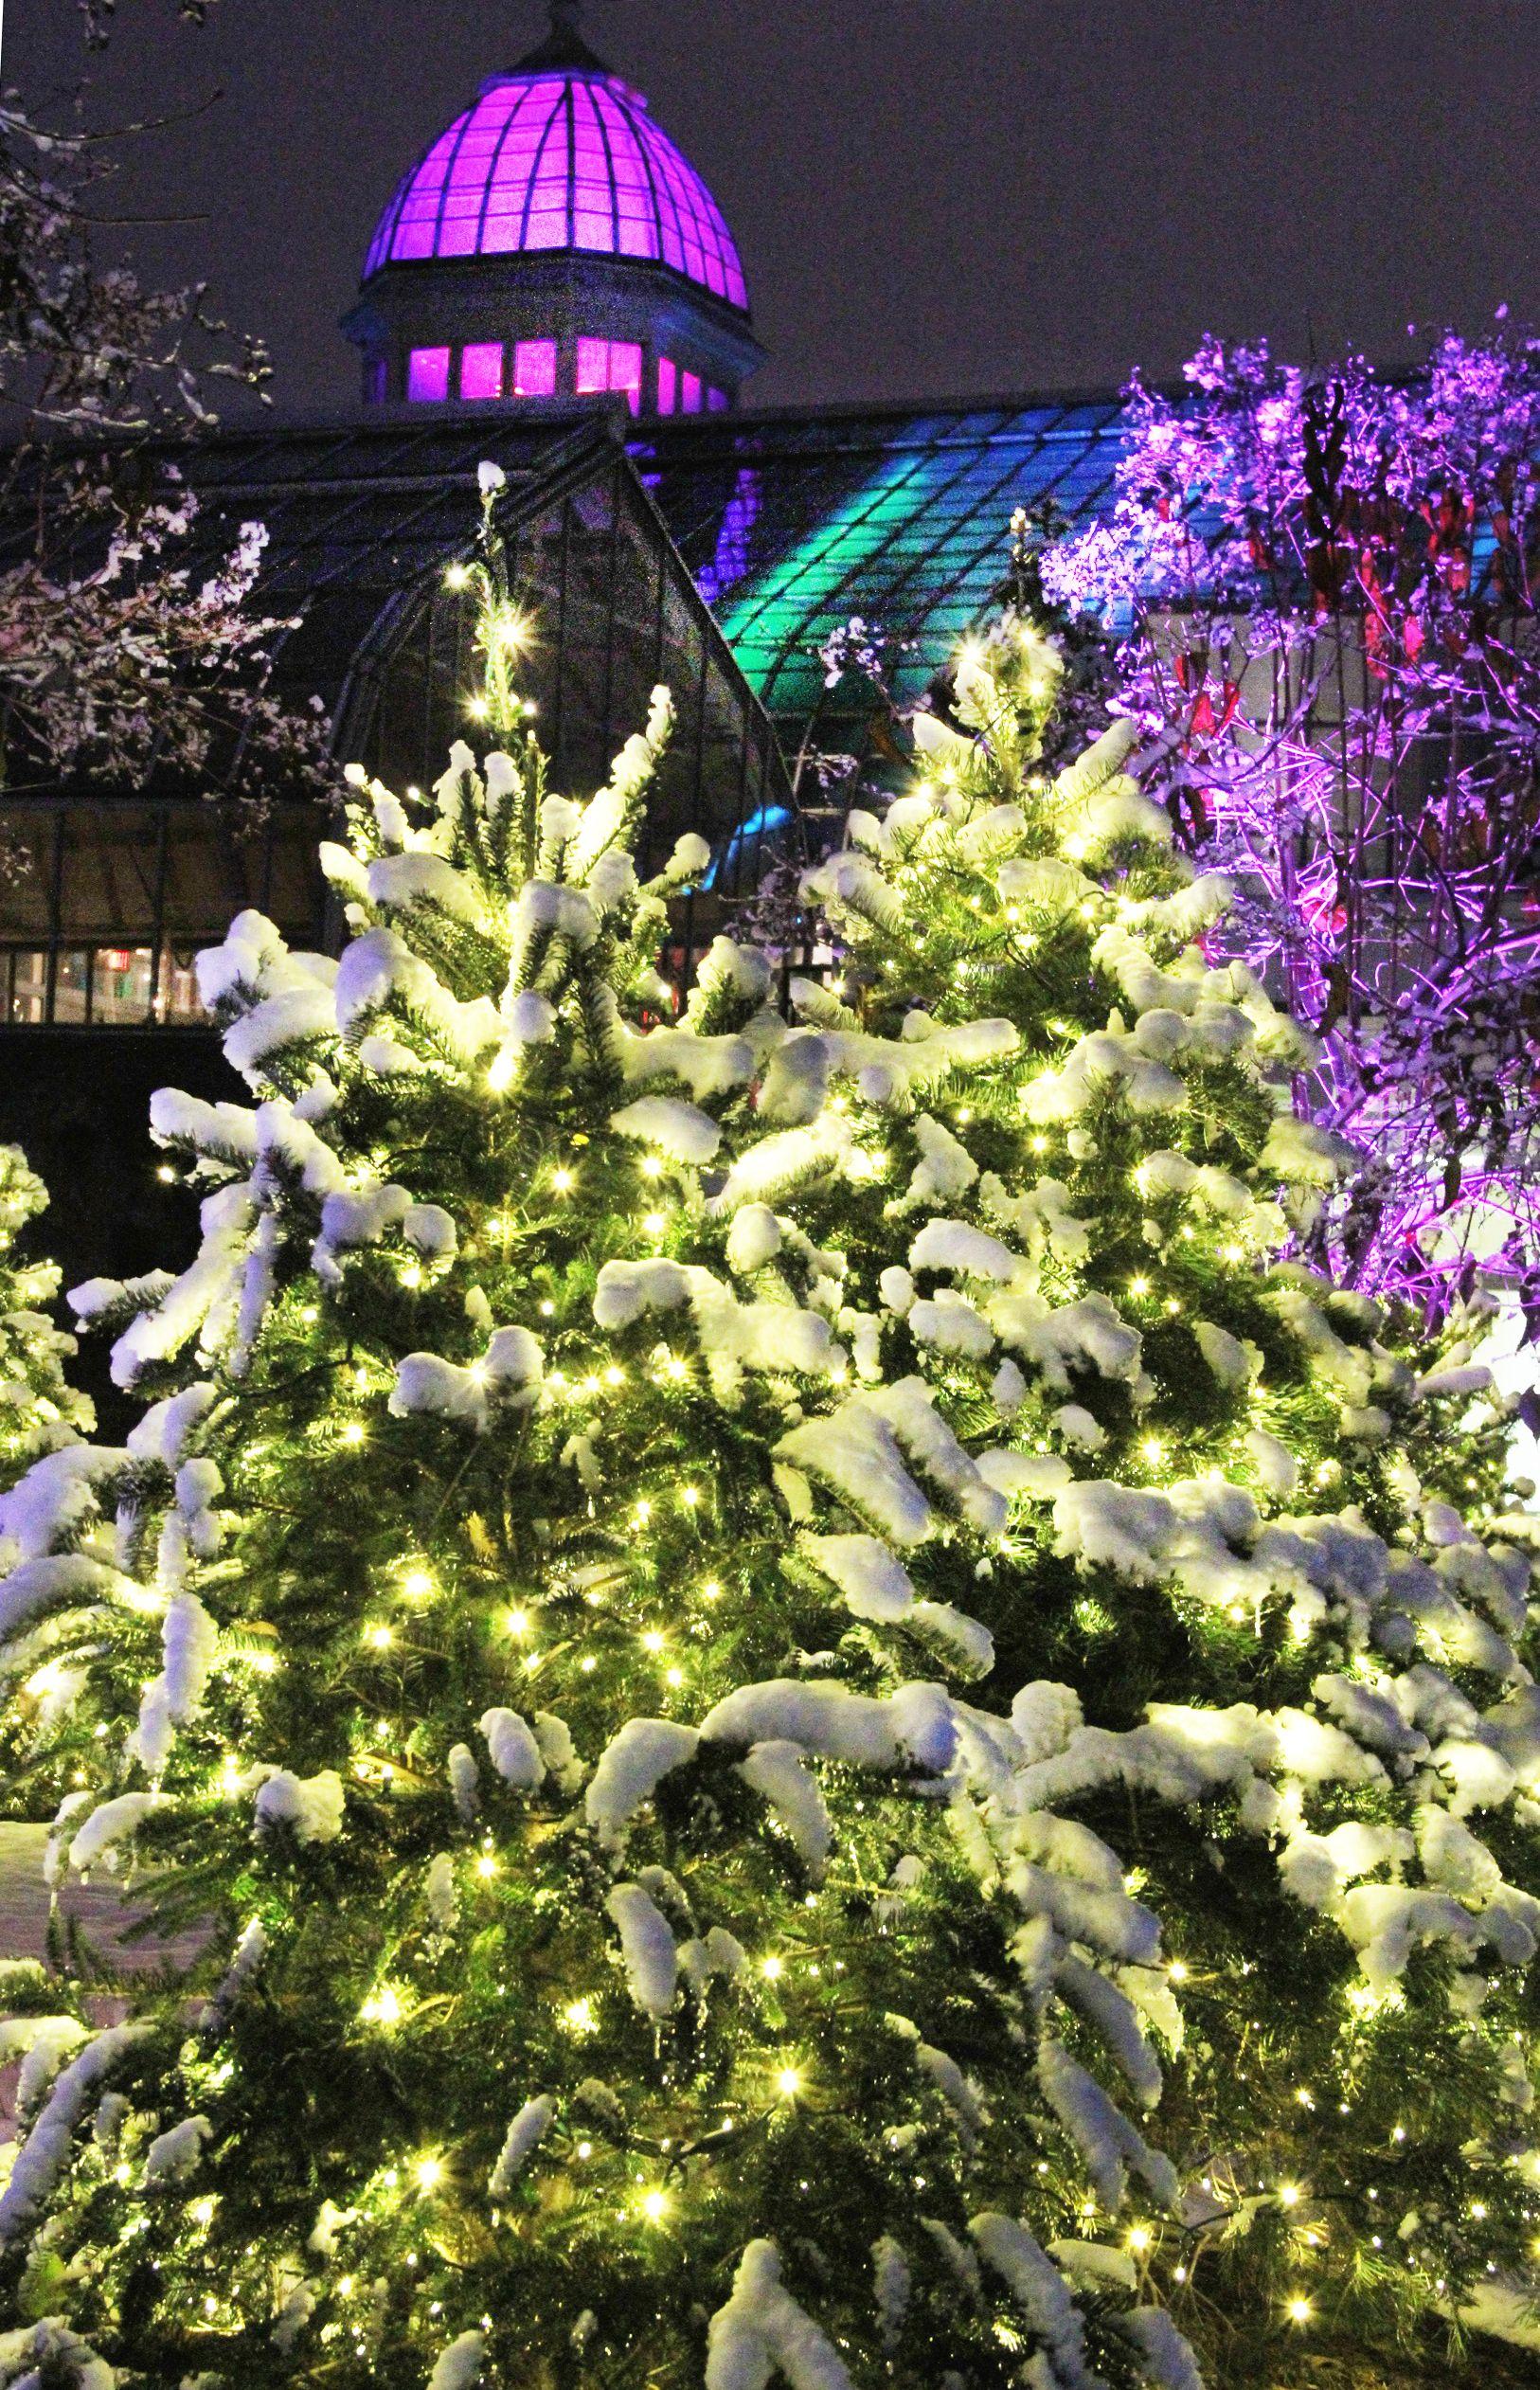 Franklin Park Conservatory Christmas Lights.Holiday Lights At Franklin Park Conservatory Columbus Oh